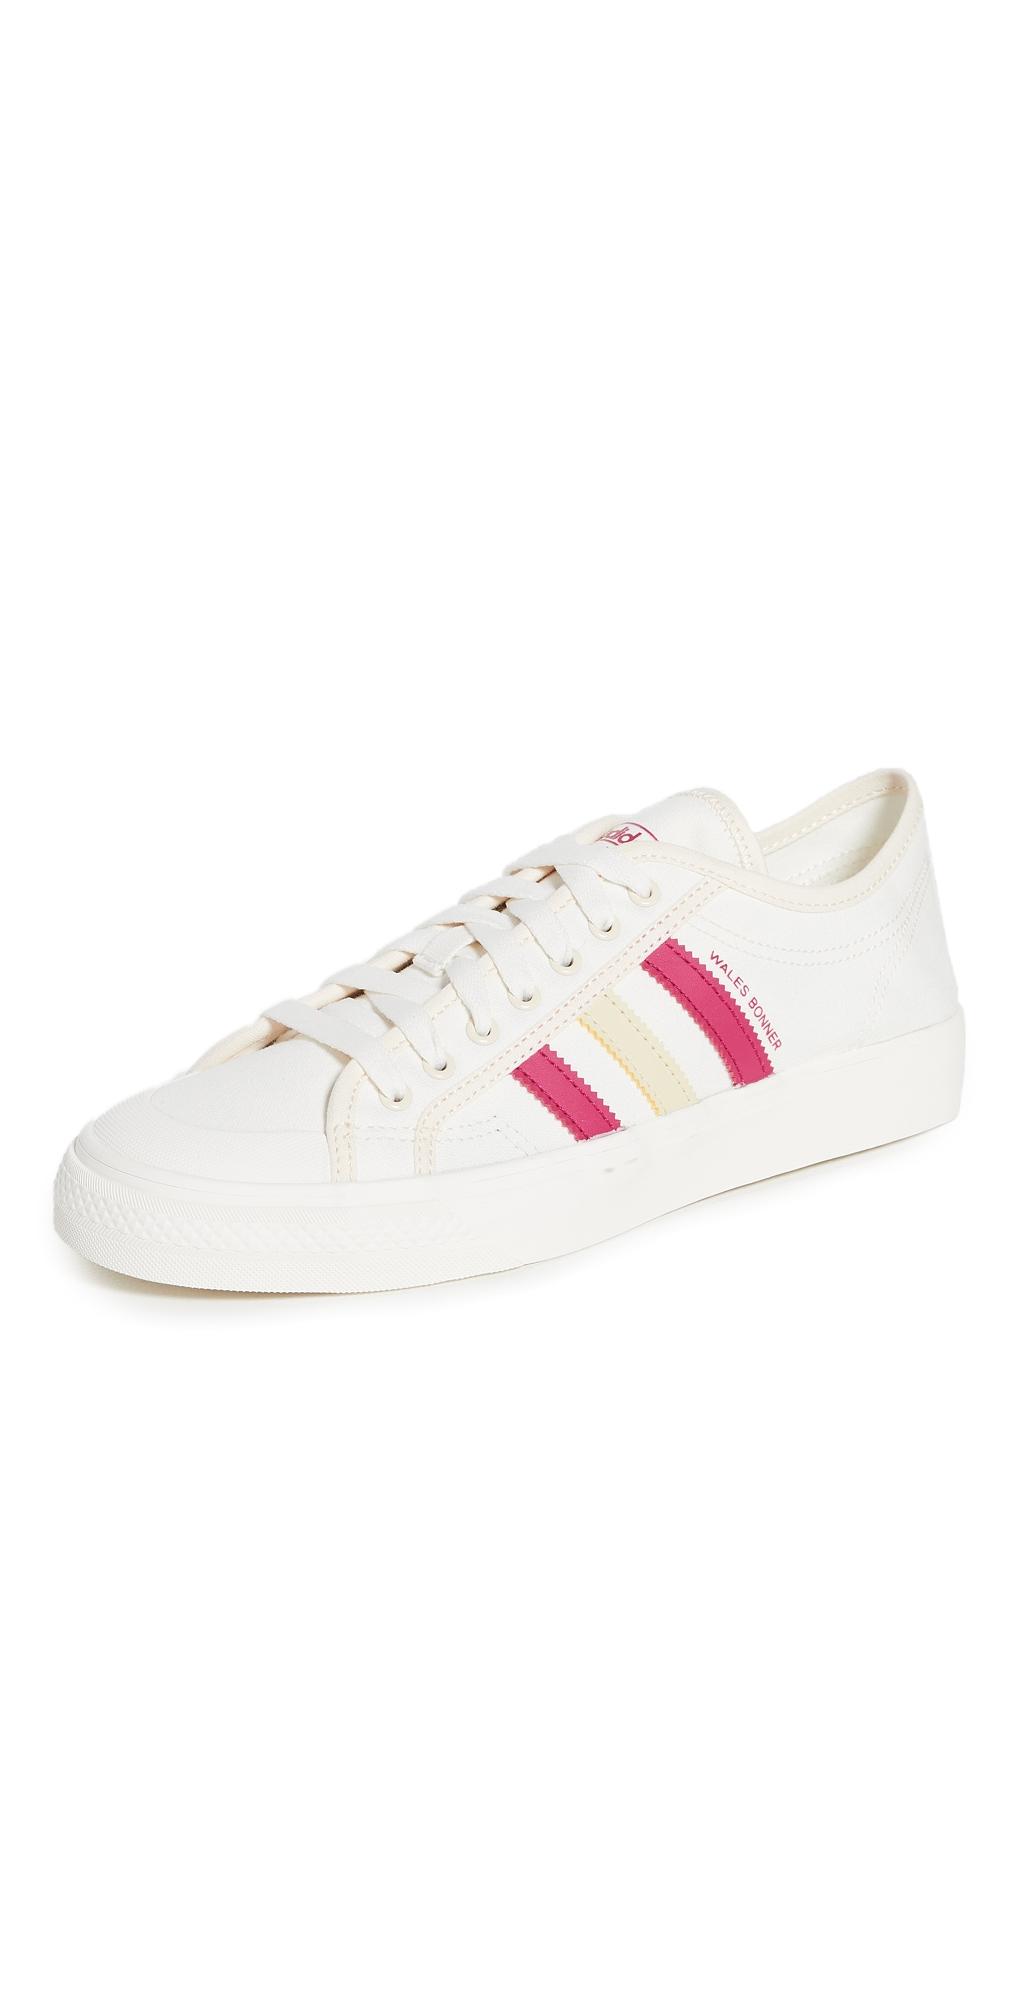 adidas X Wales Bonner Nizza Low-Top Sneakers